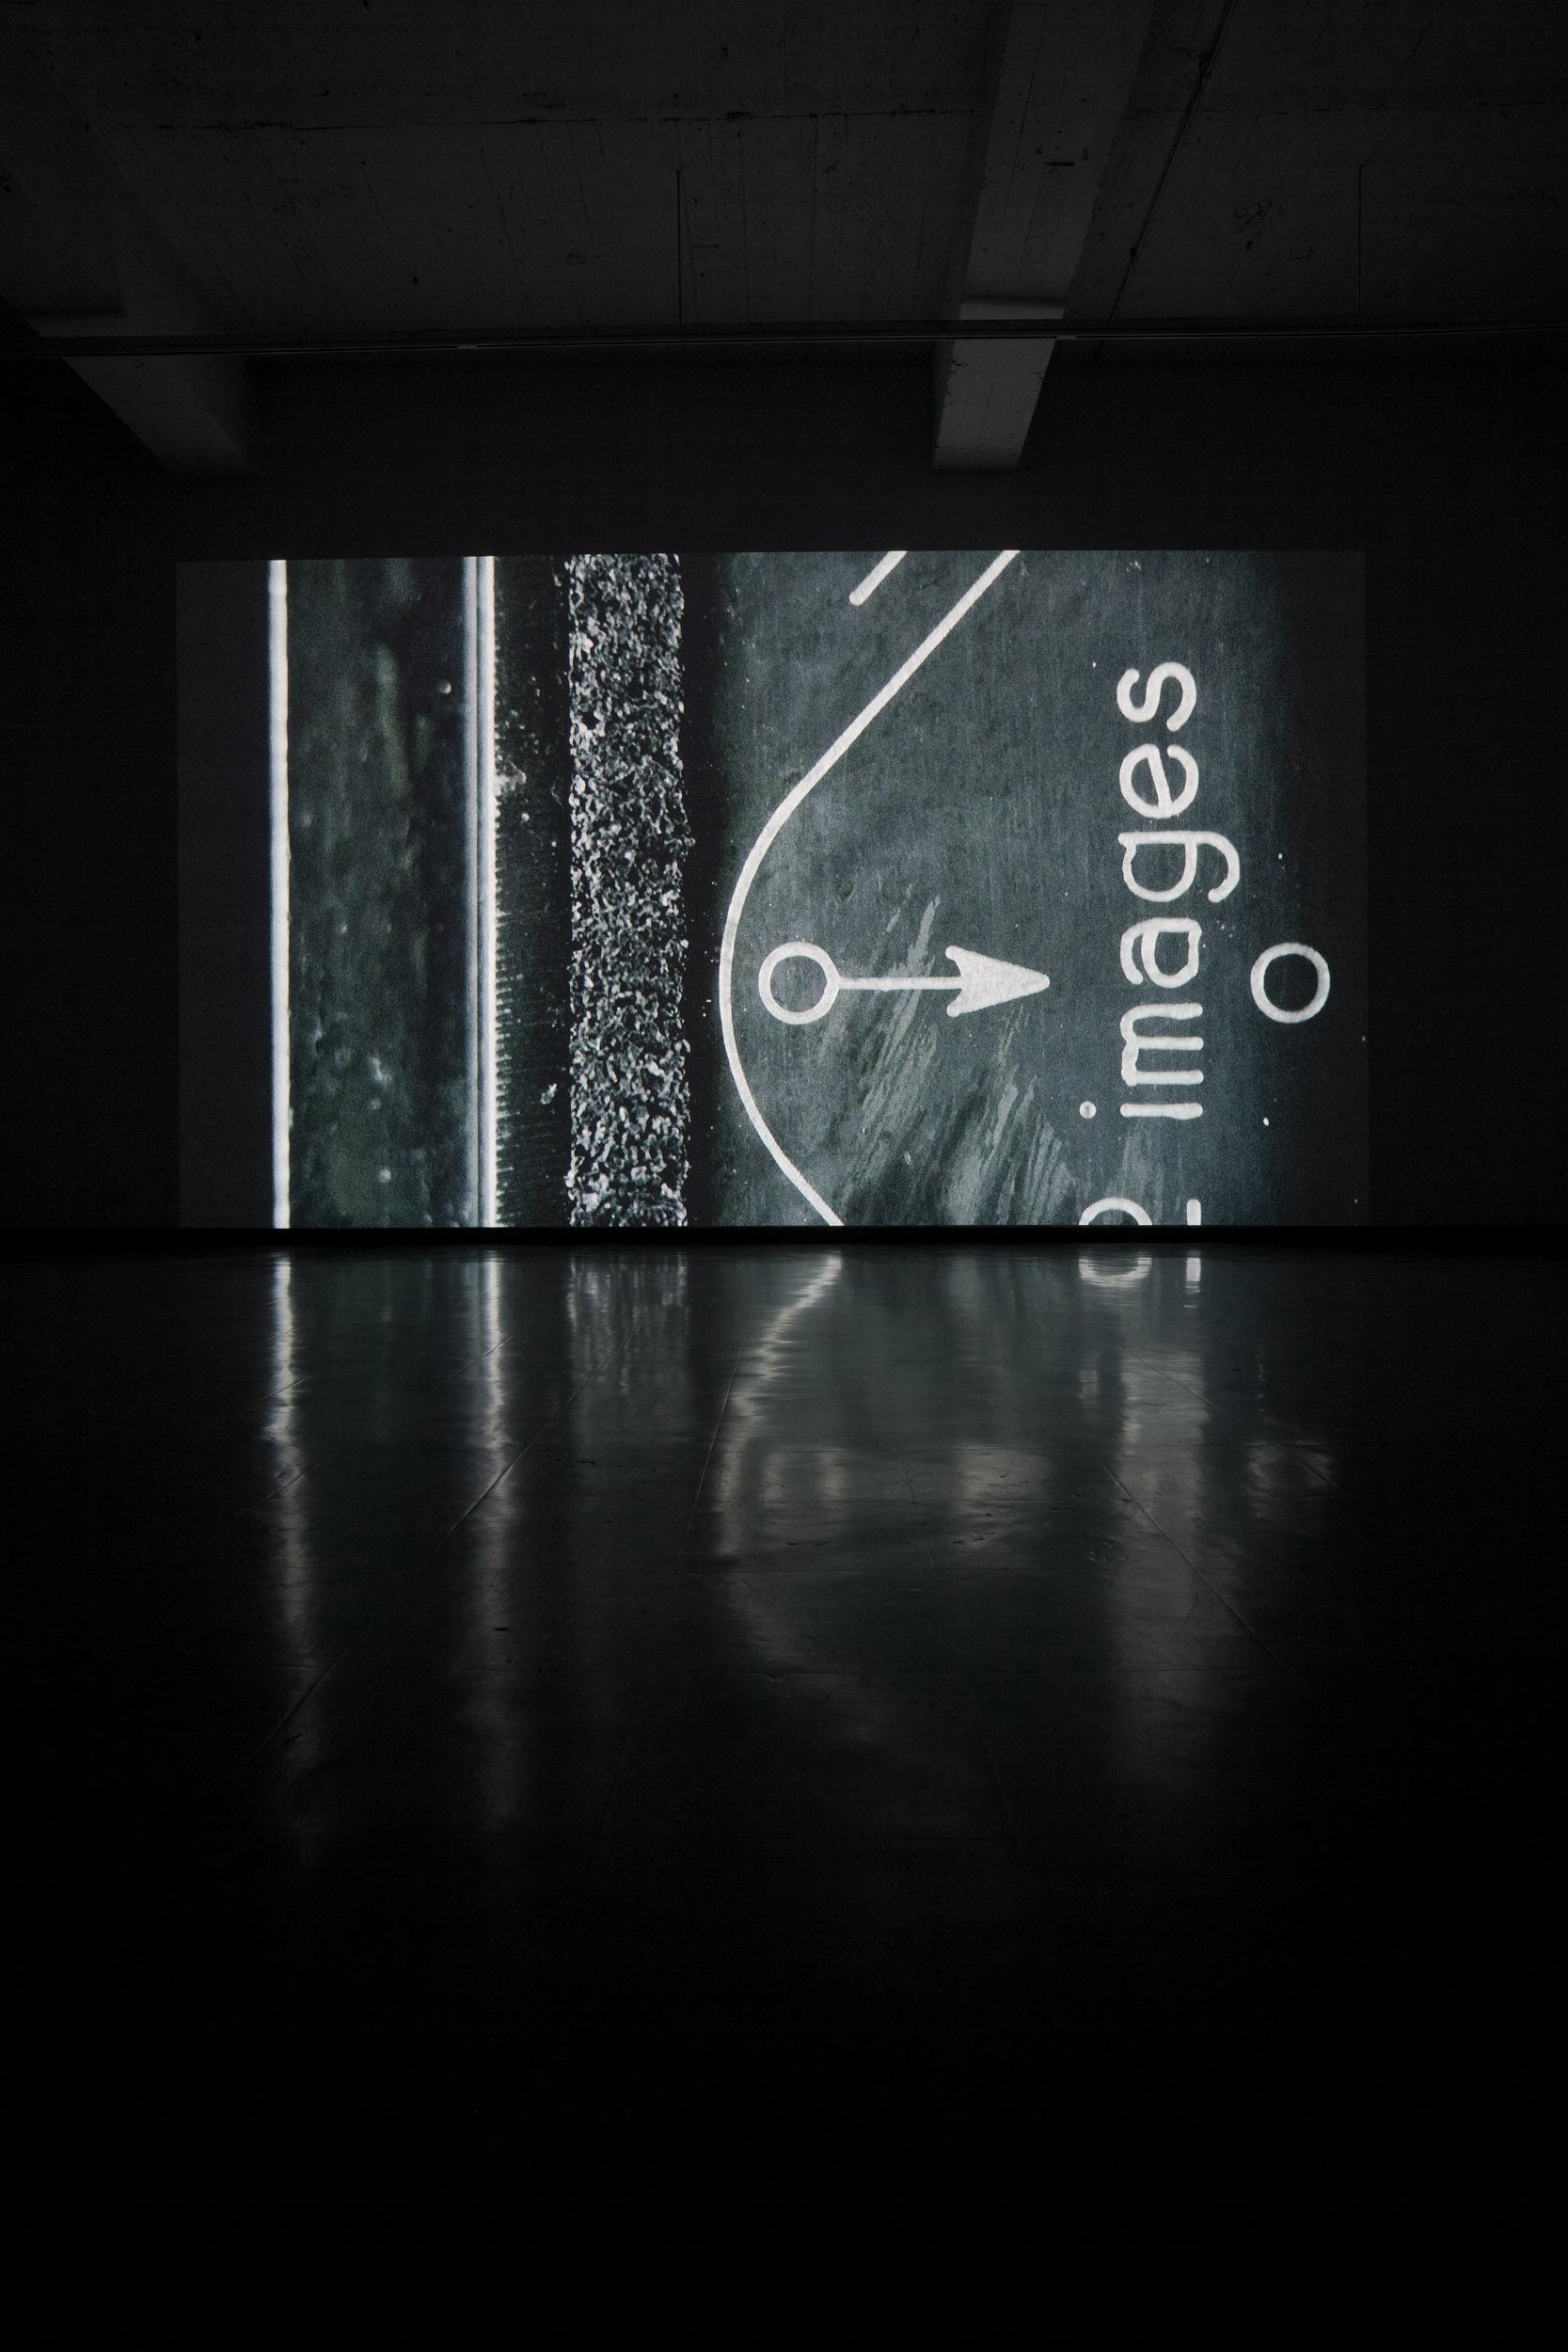 THE NEUTRALITY ESCAPE 2008  Video projection 25', 11 min. PASCAL GRANDMAISON ©